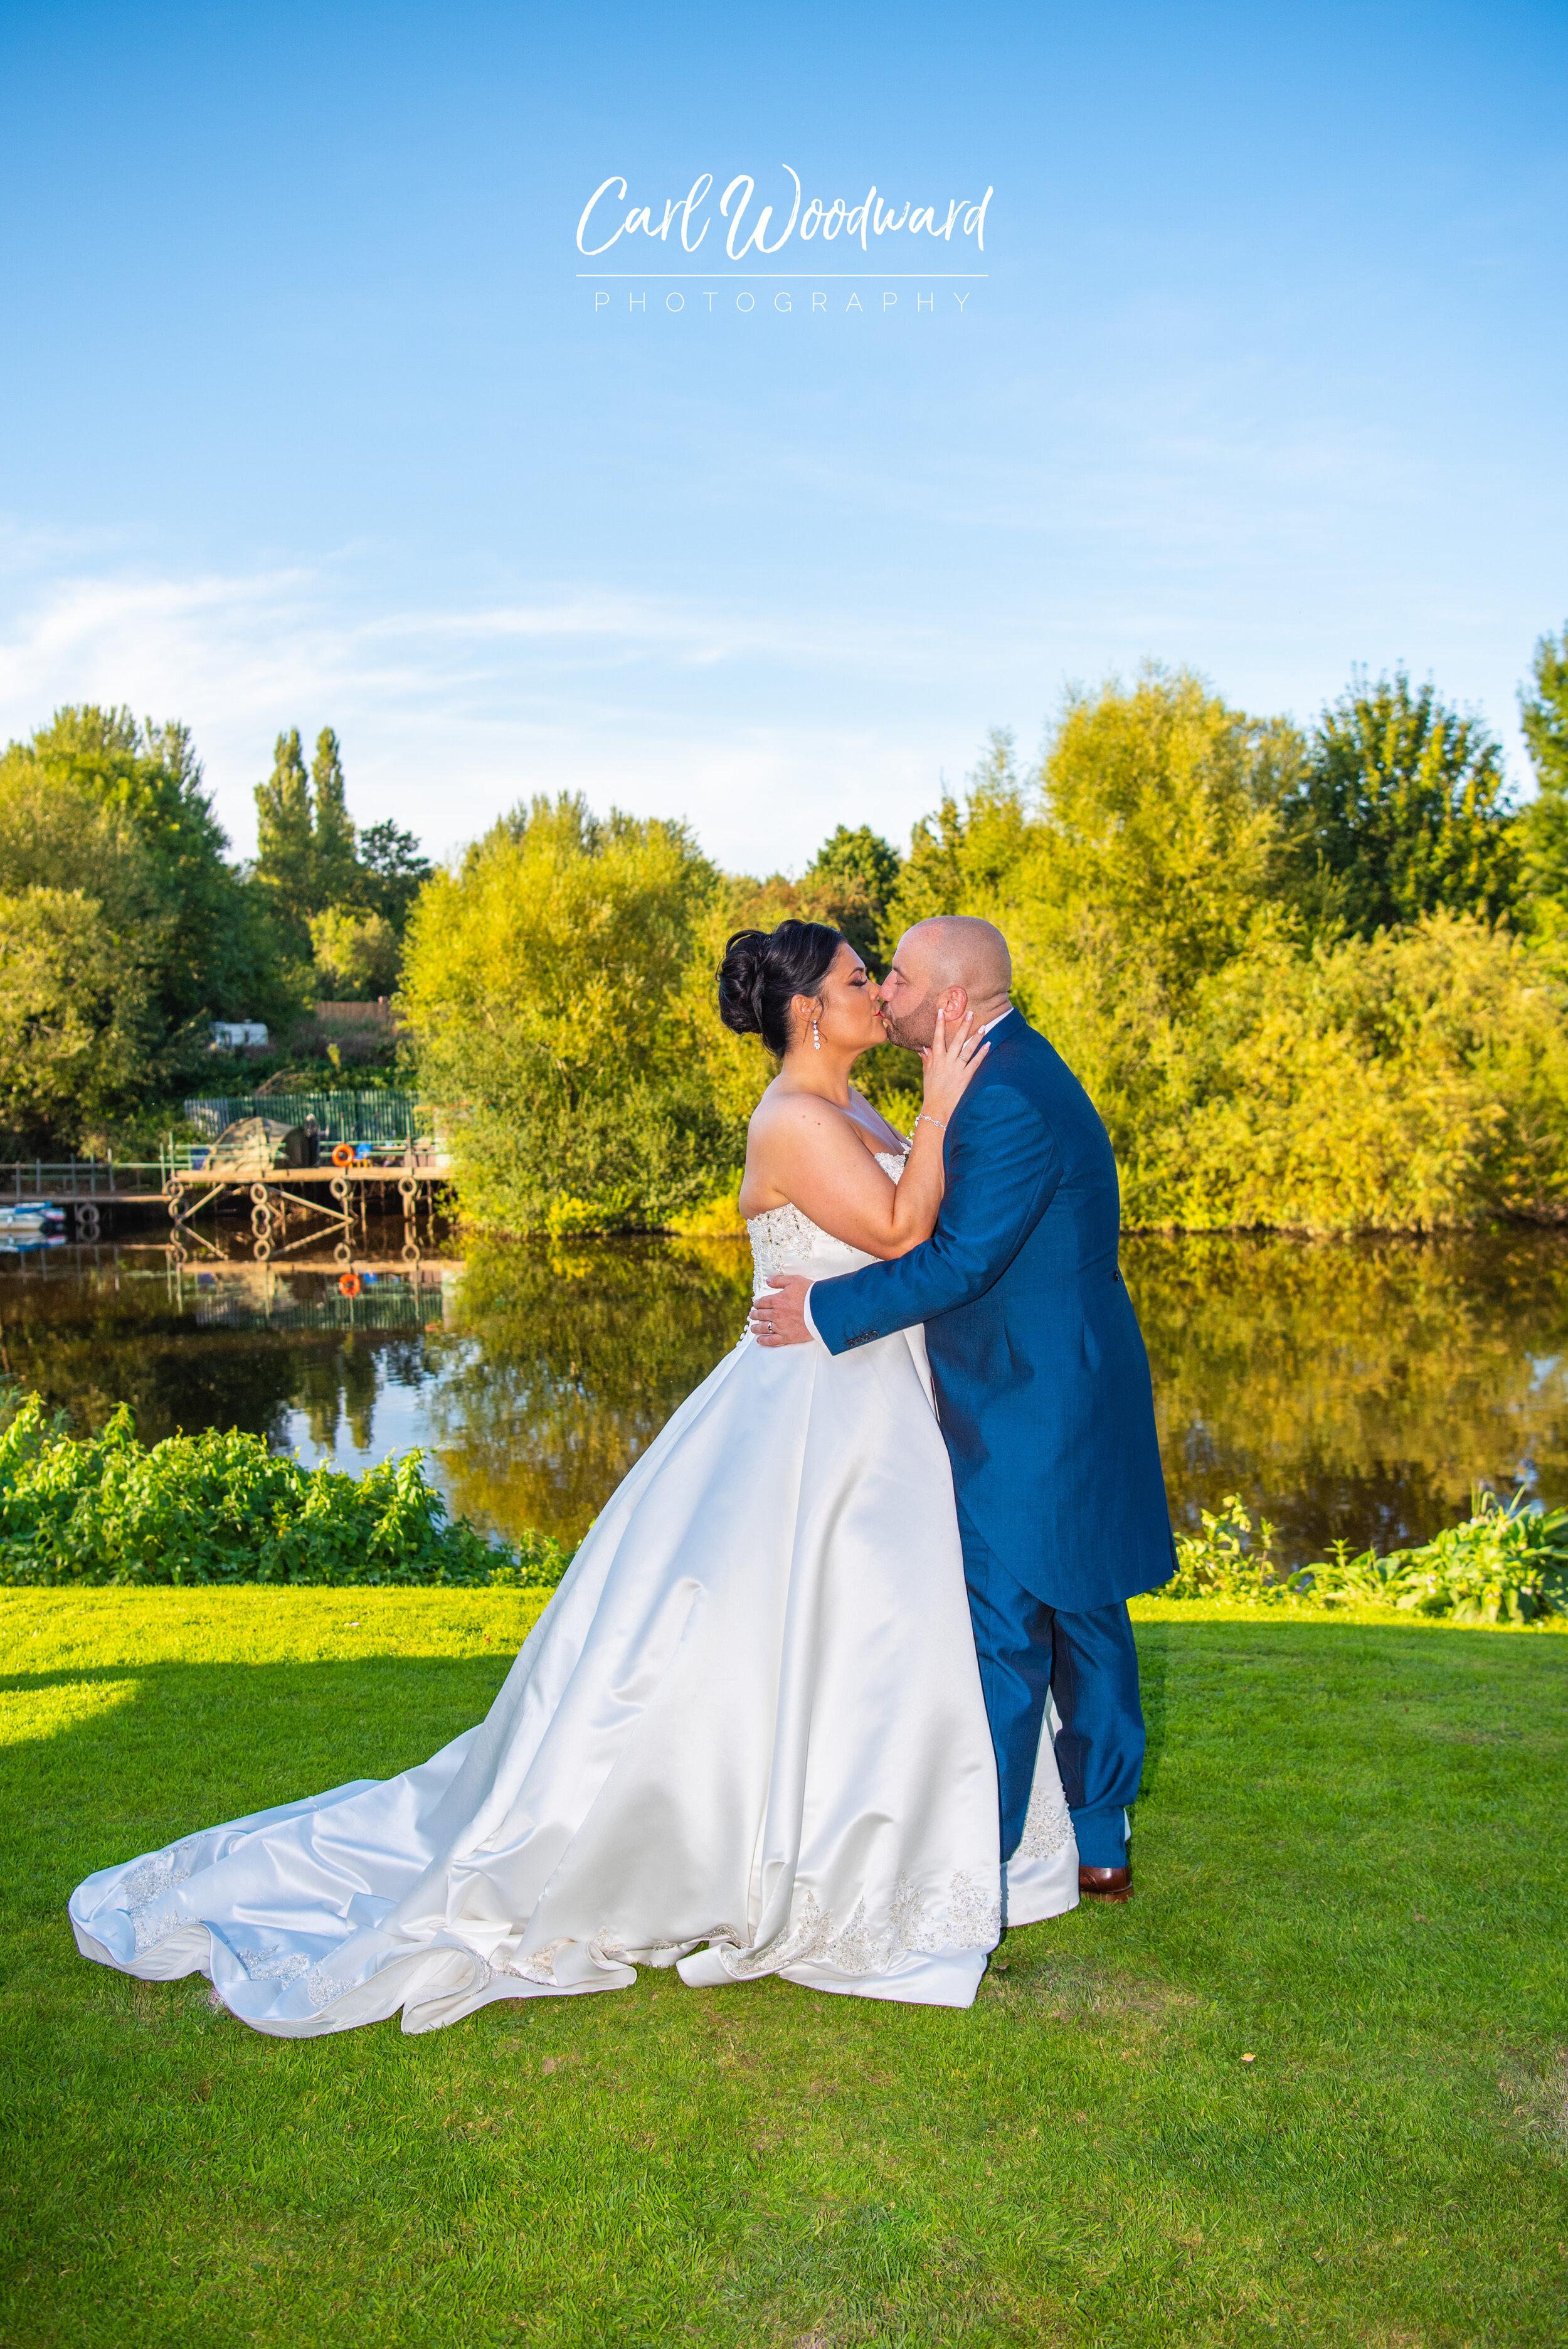 013-The-Holt-Fleet-Wedding-Photos.jpg